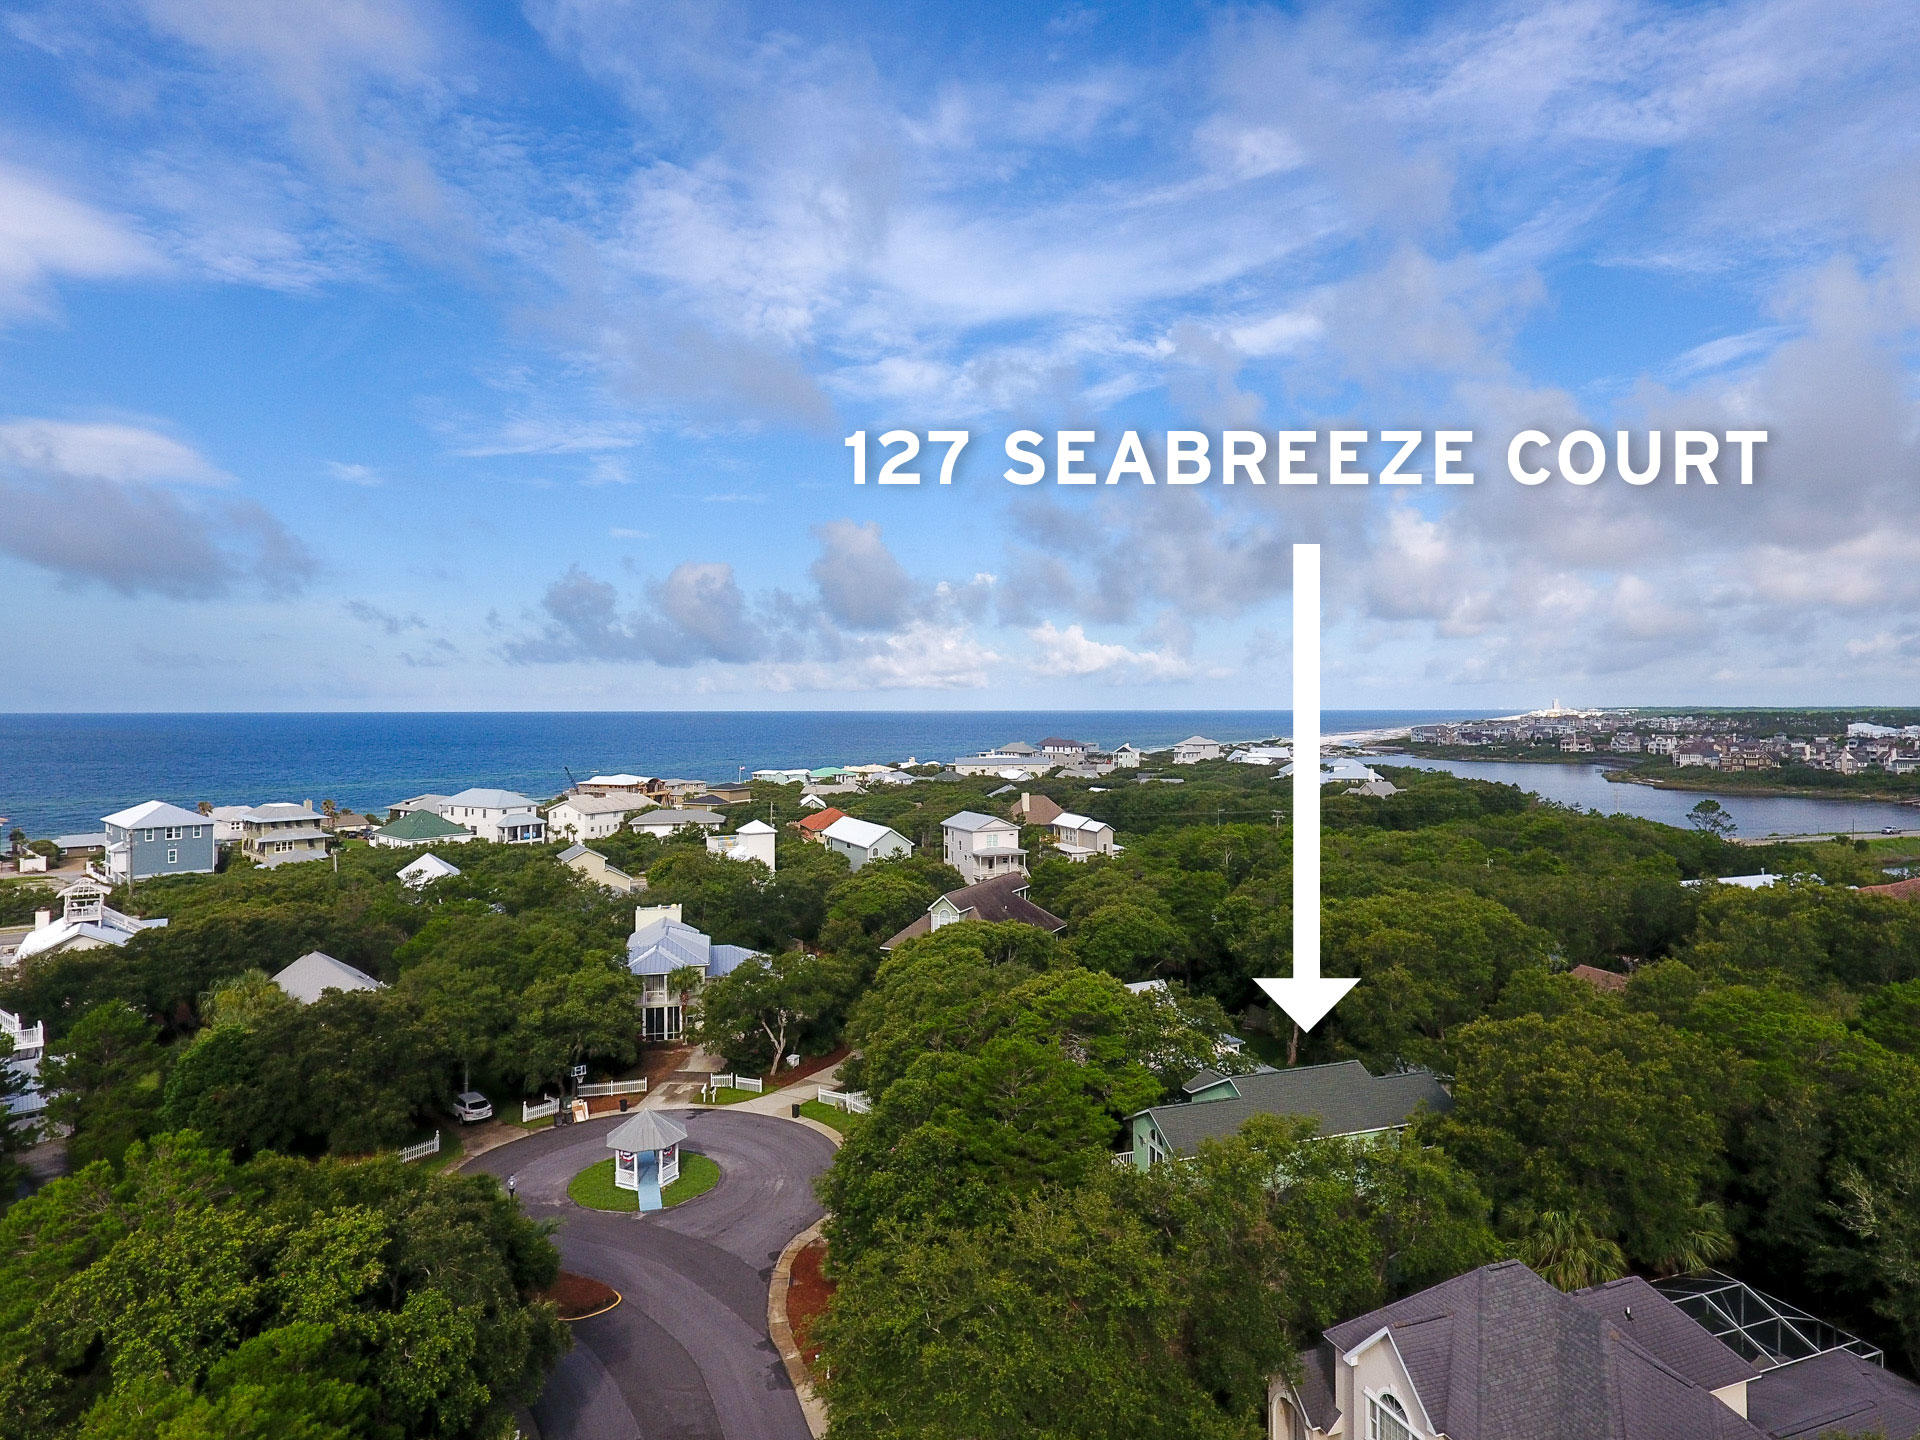 127 Seabreeze Court  Photo 2